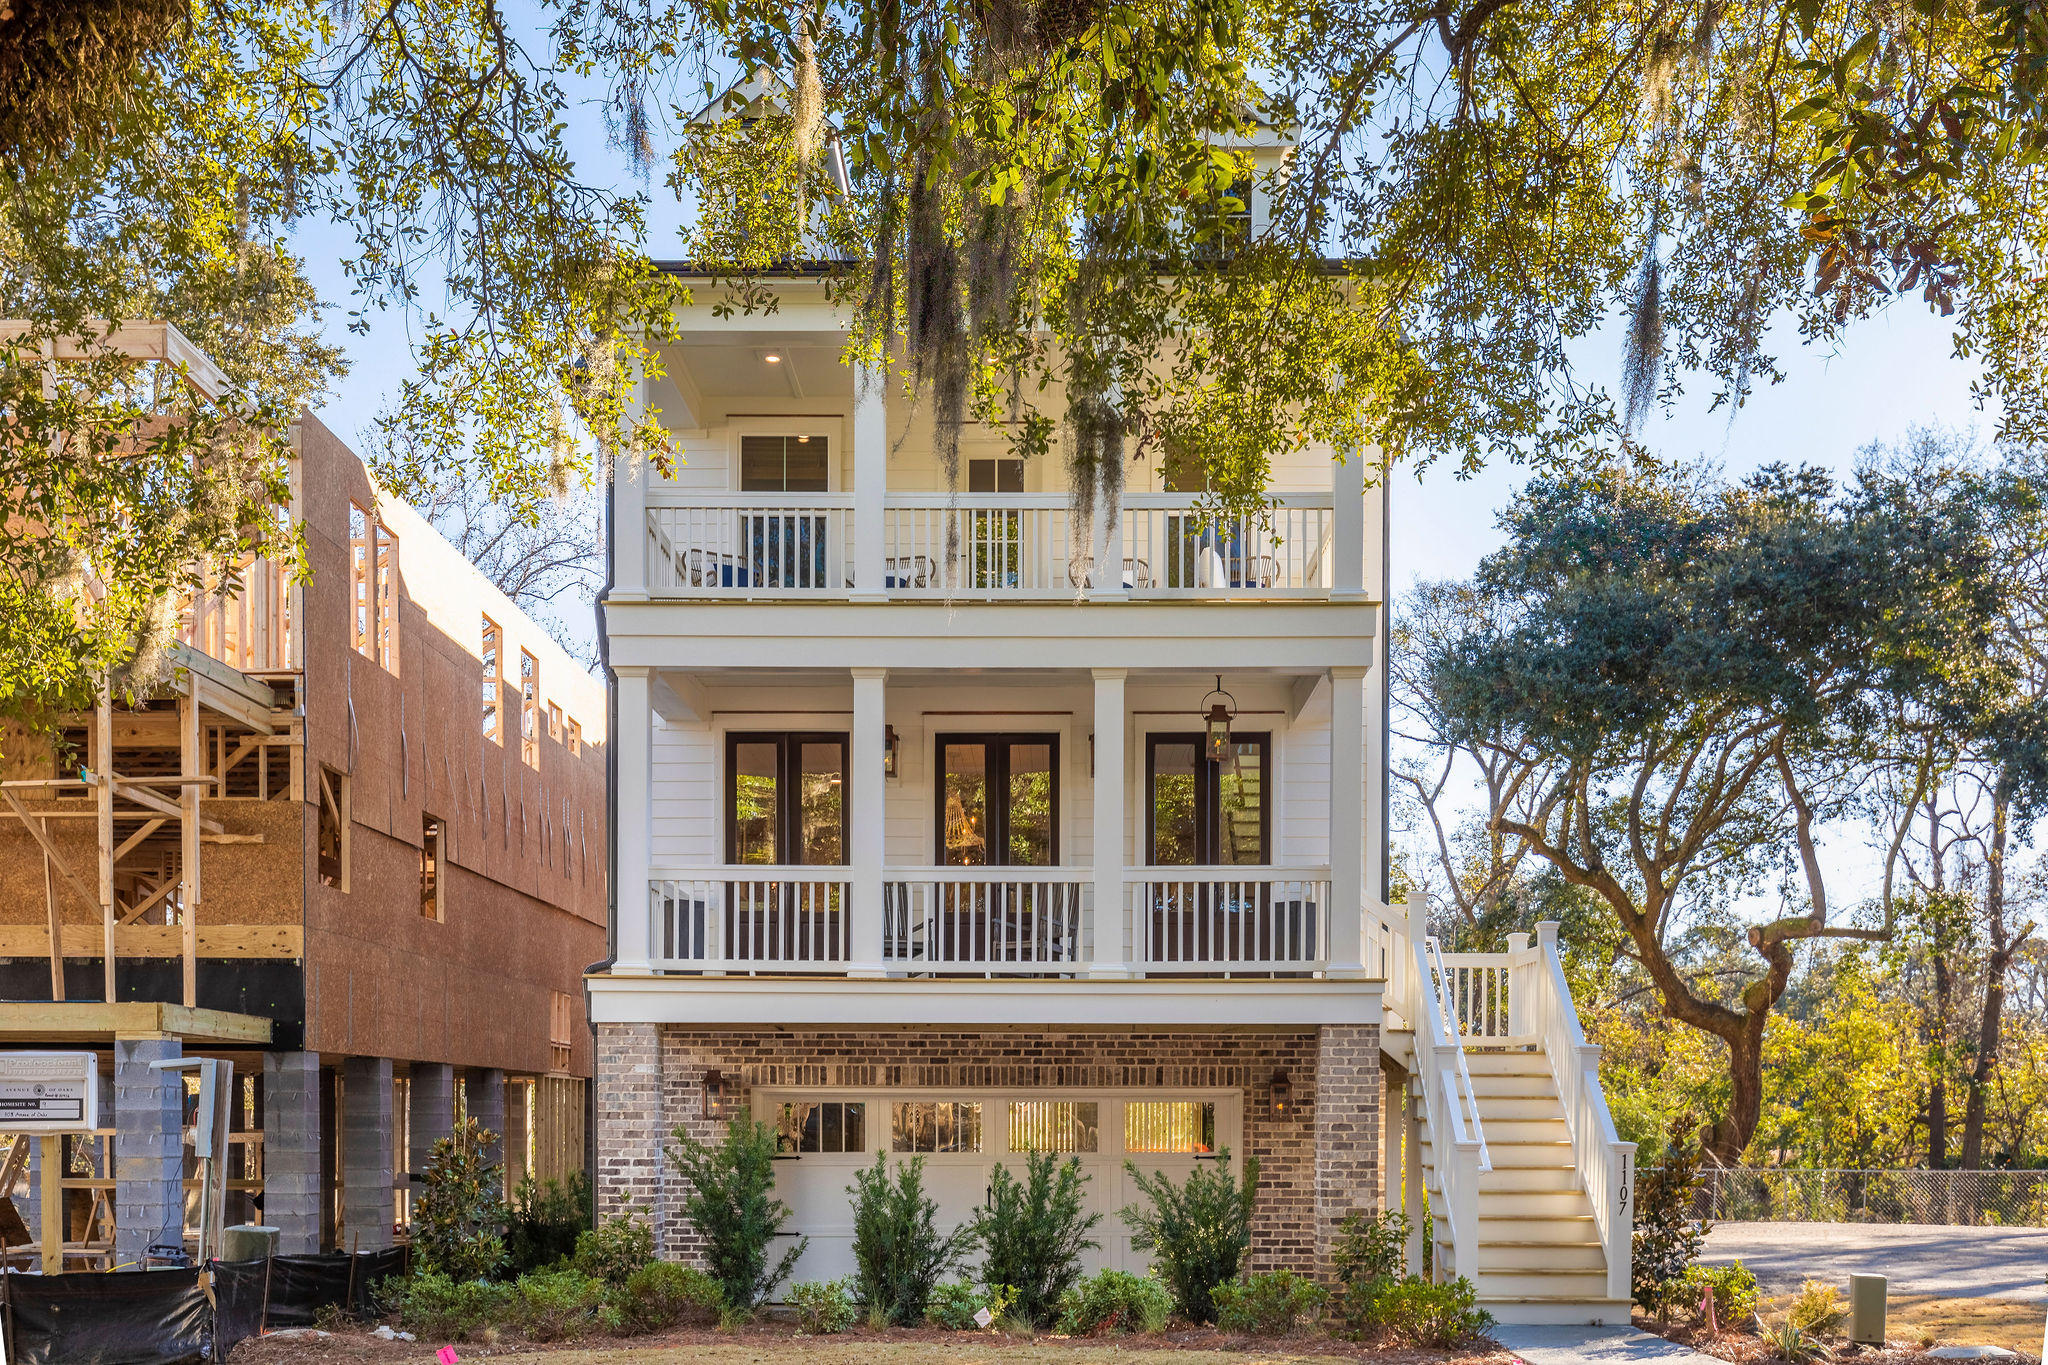 Avenue of Oaks Homes For Sale - 1027 Avenue Of Oaks, Charleston, SC - 49